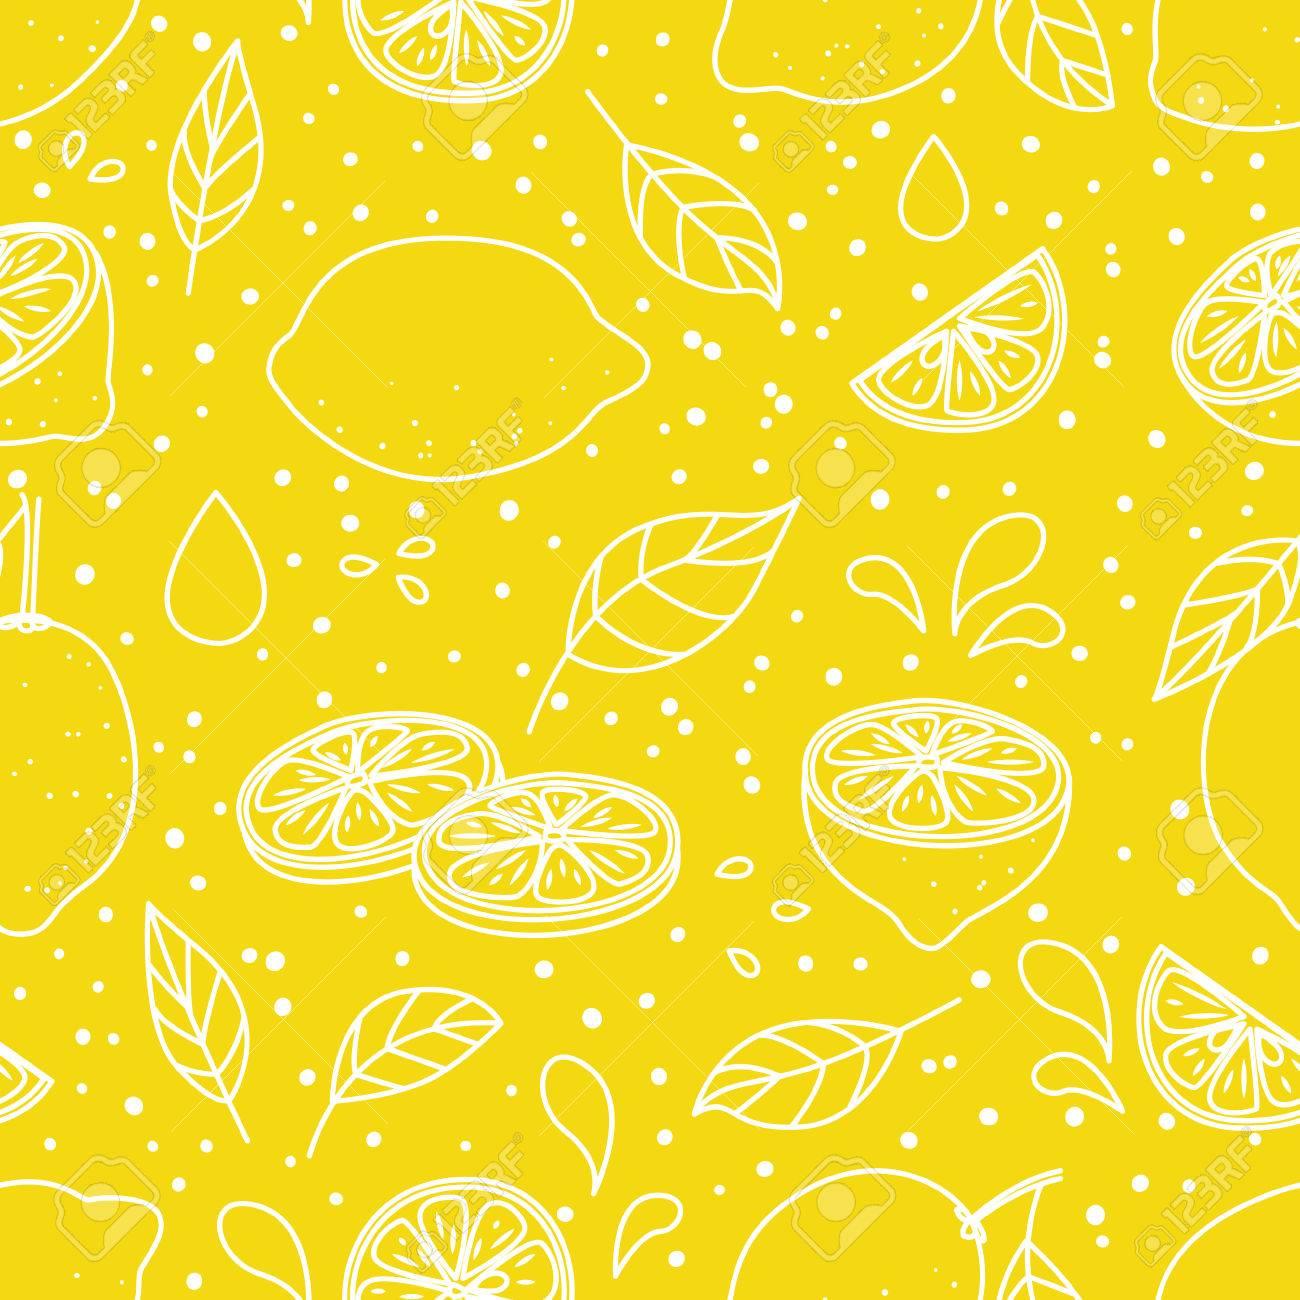 Seamless pattern with juicy lemons - 56500856